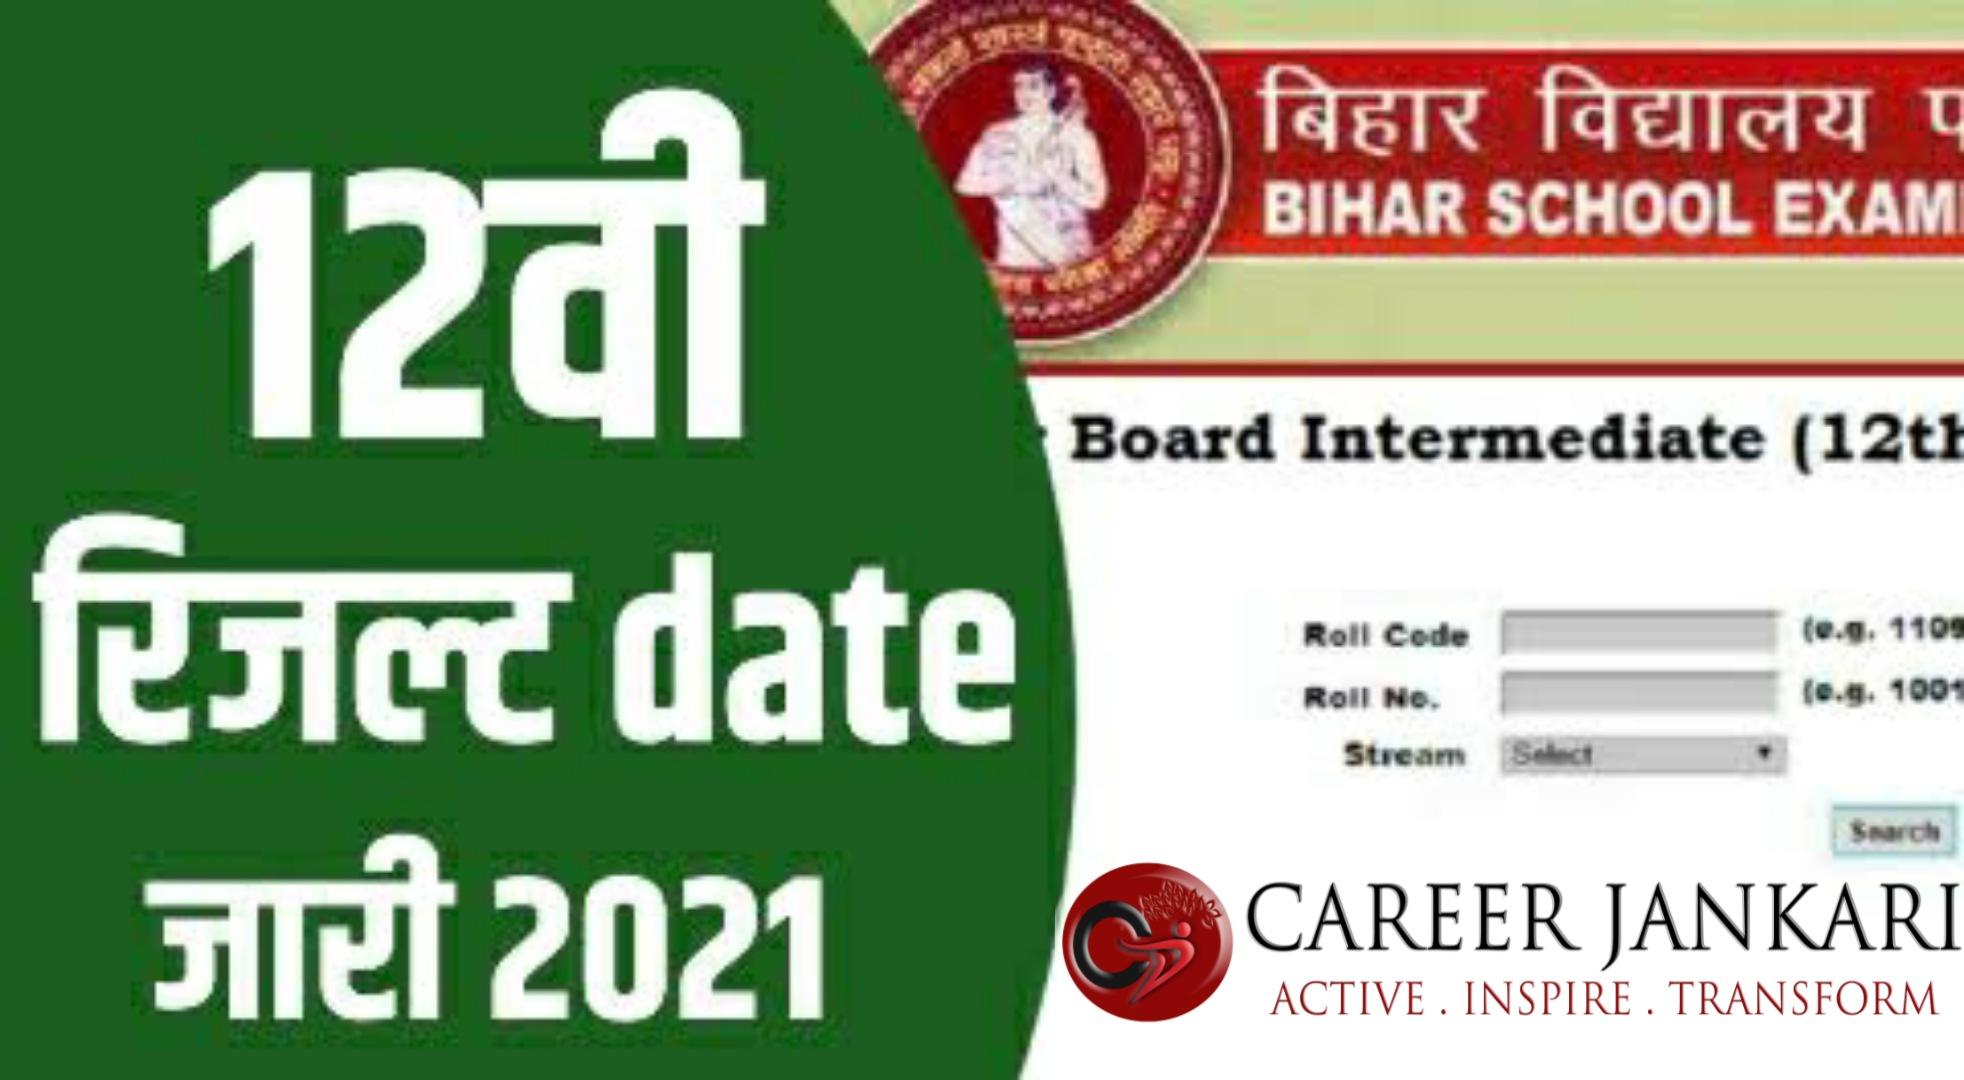 BSEB Bihar Board Inter Result Date 2021